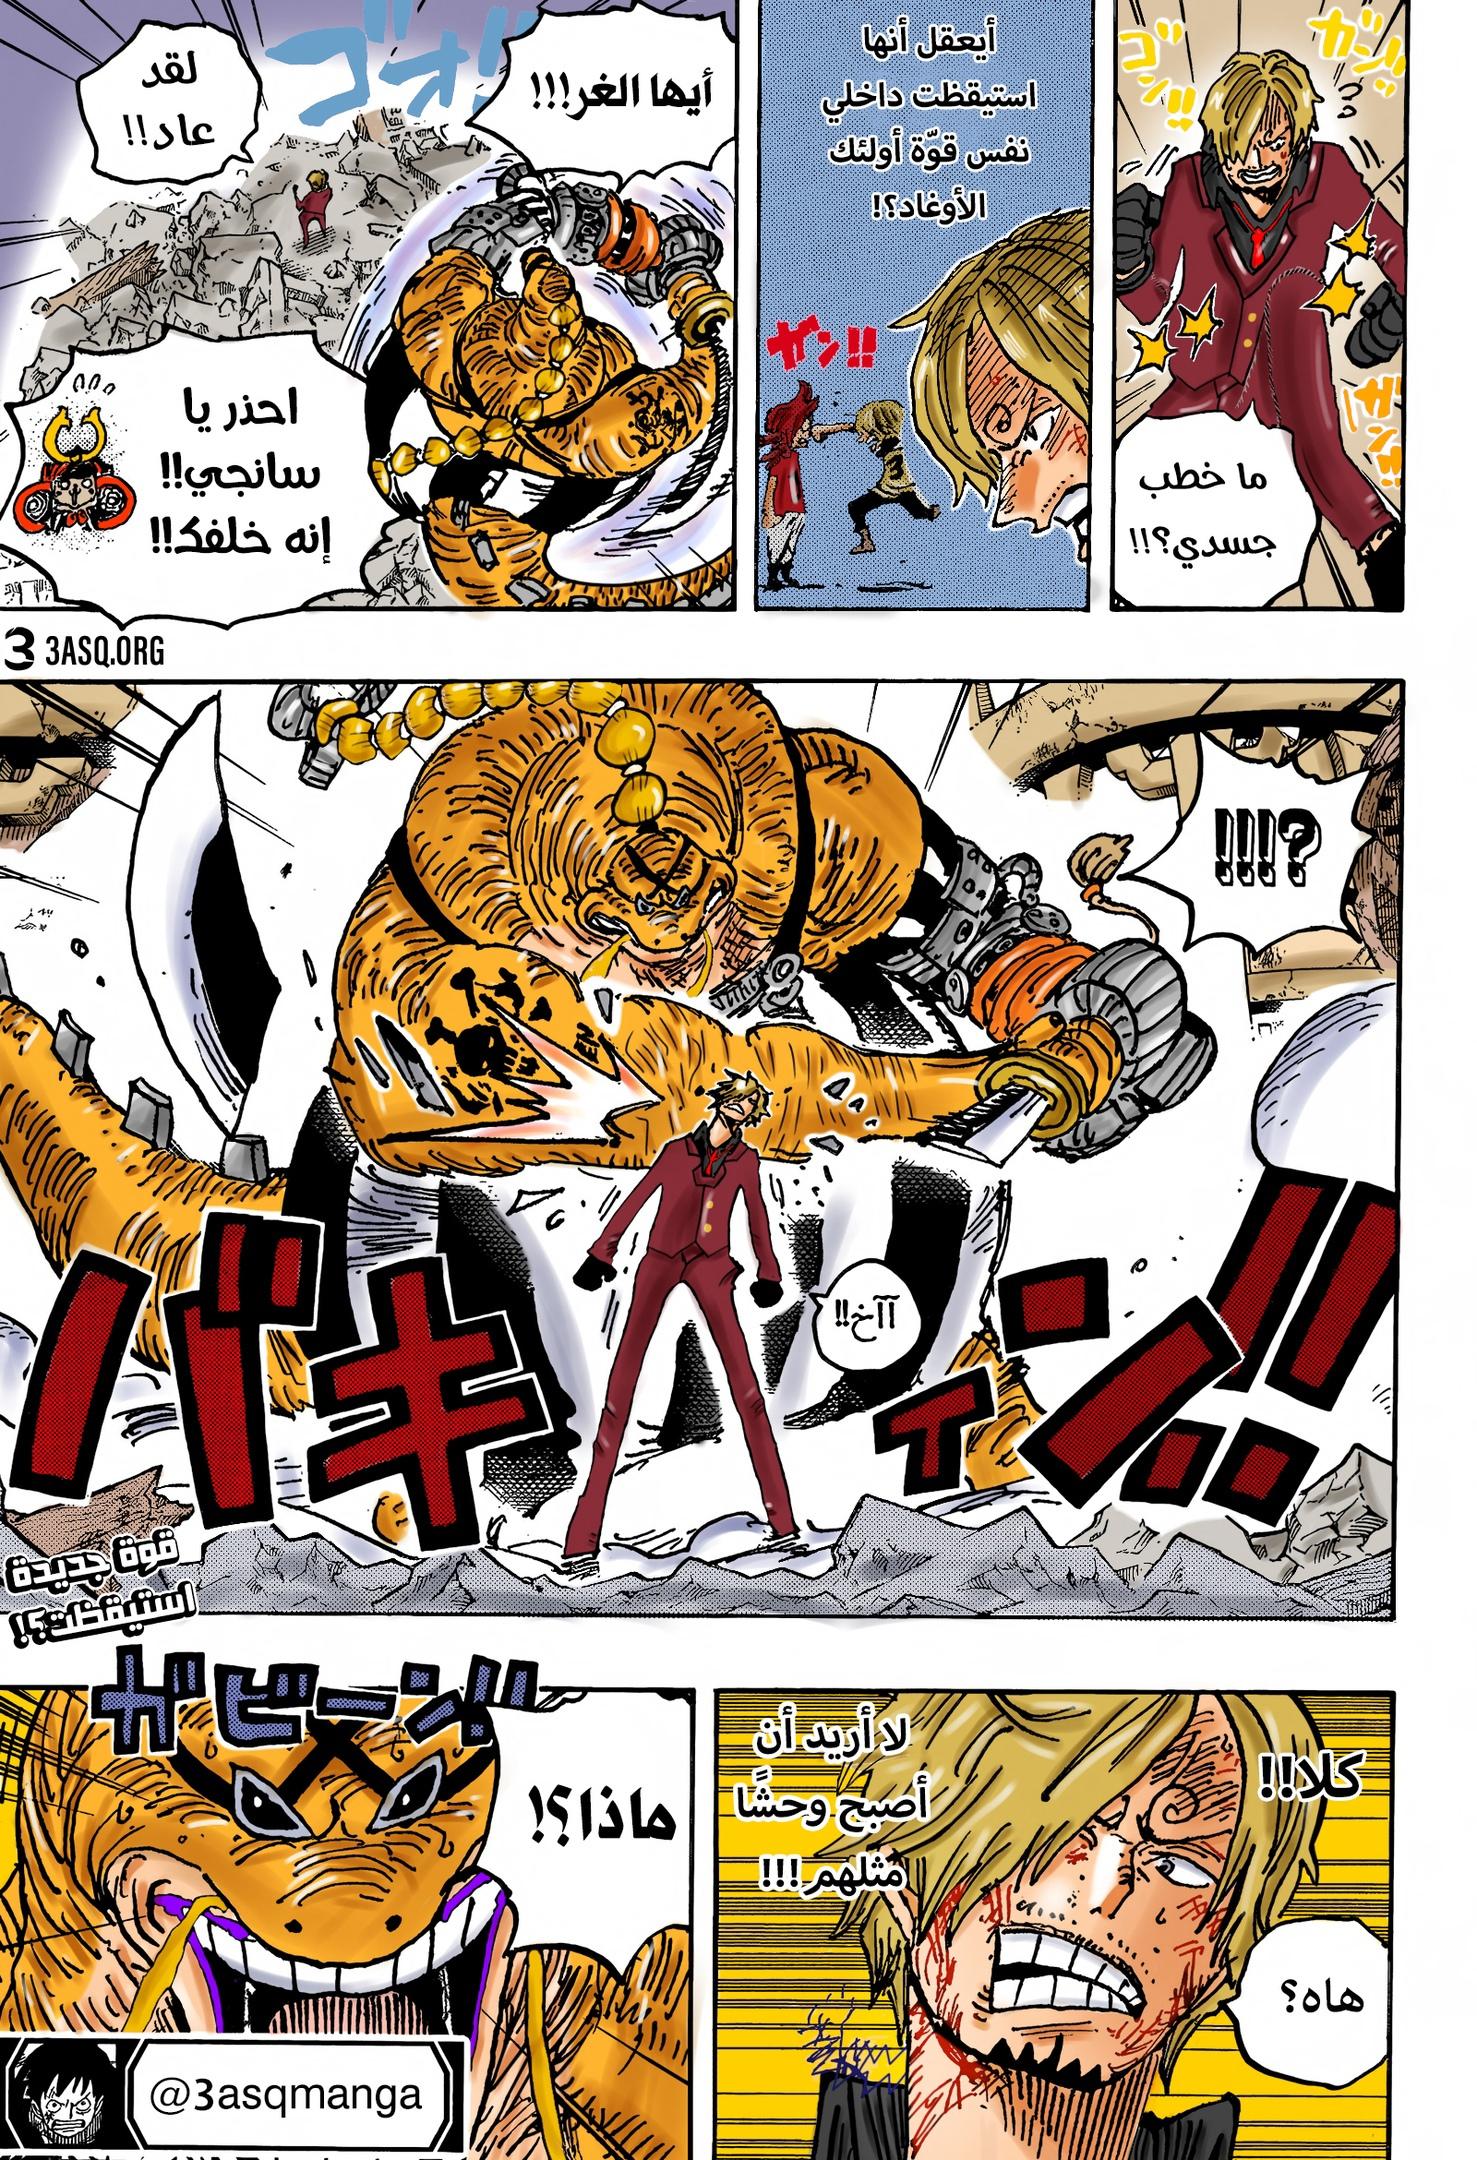 Arab One Piece 1028, image №18